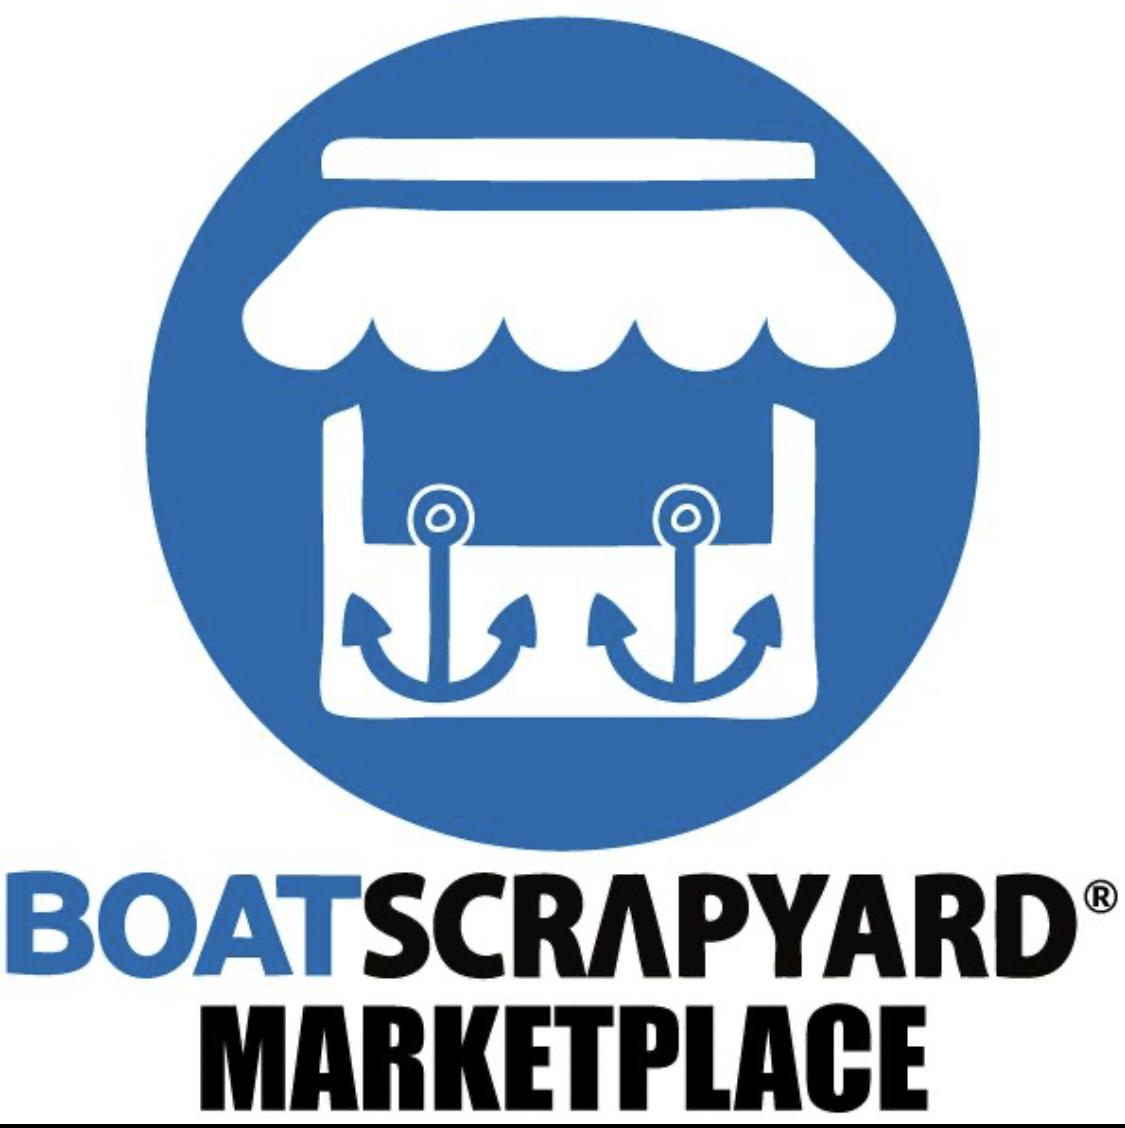 Boat Scrapyard Marketplace